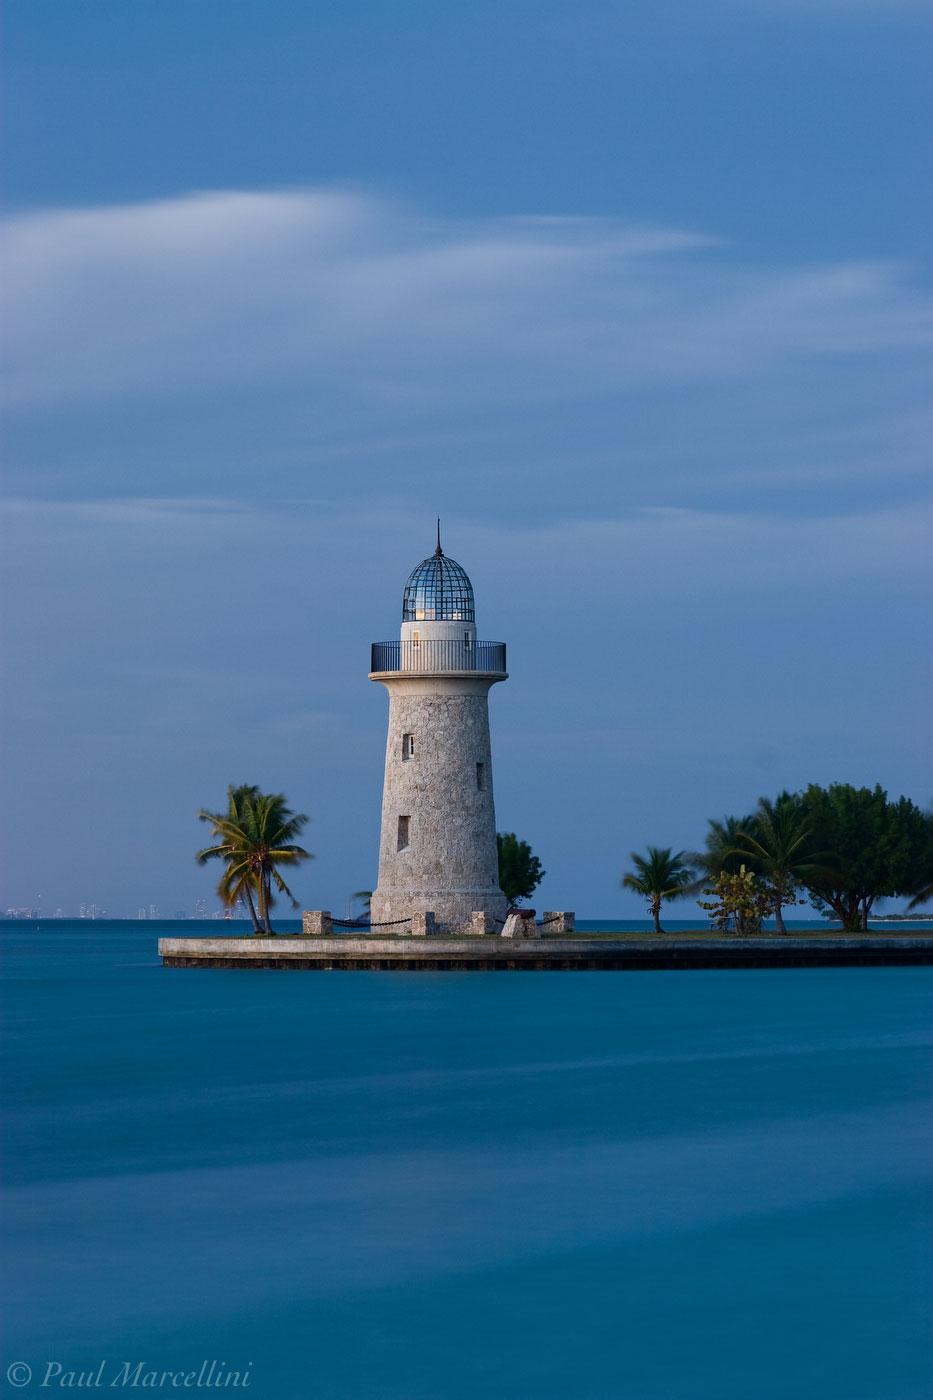 boca chita, biscayne national park, twilight, lighthouse, florida, south florida, nature, photography, photo